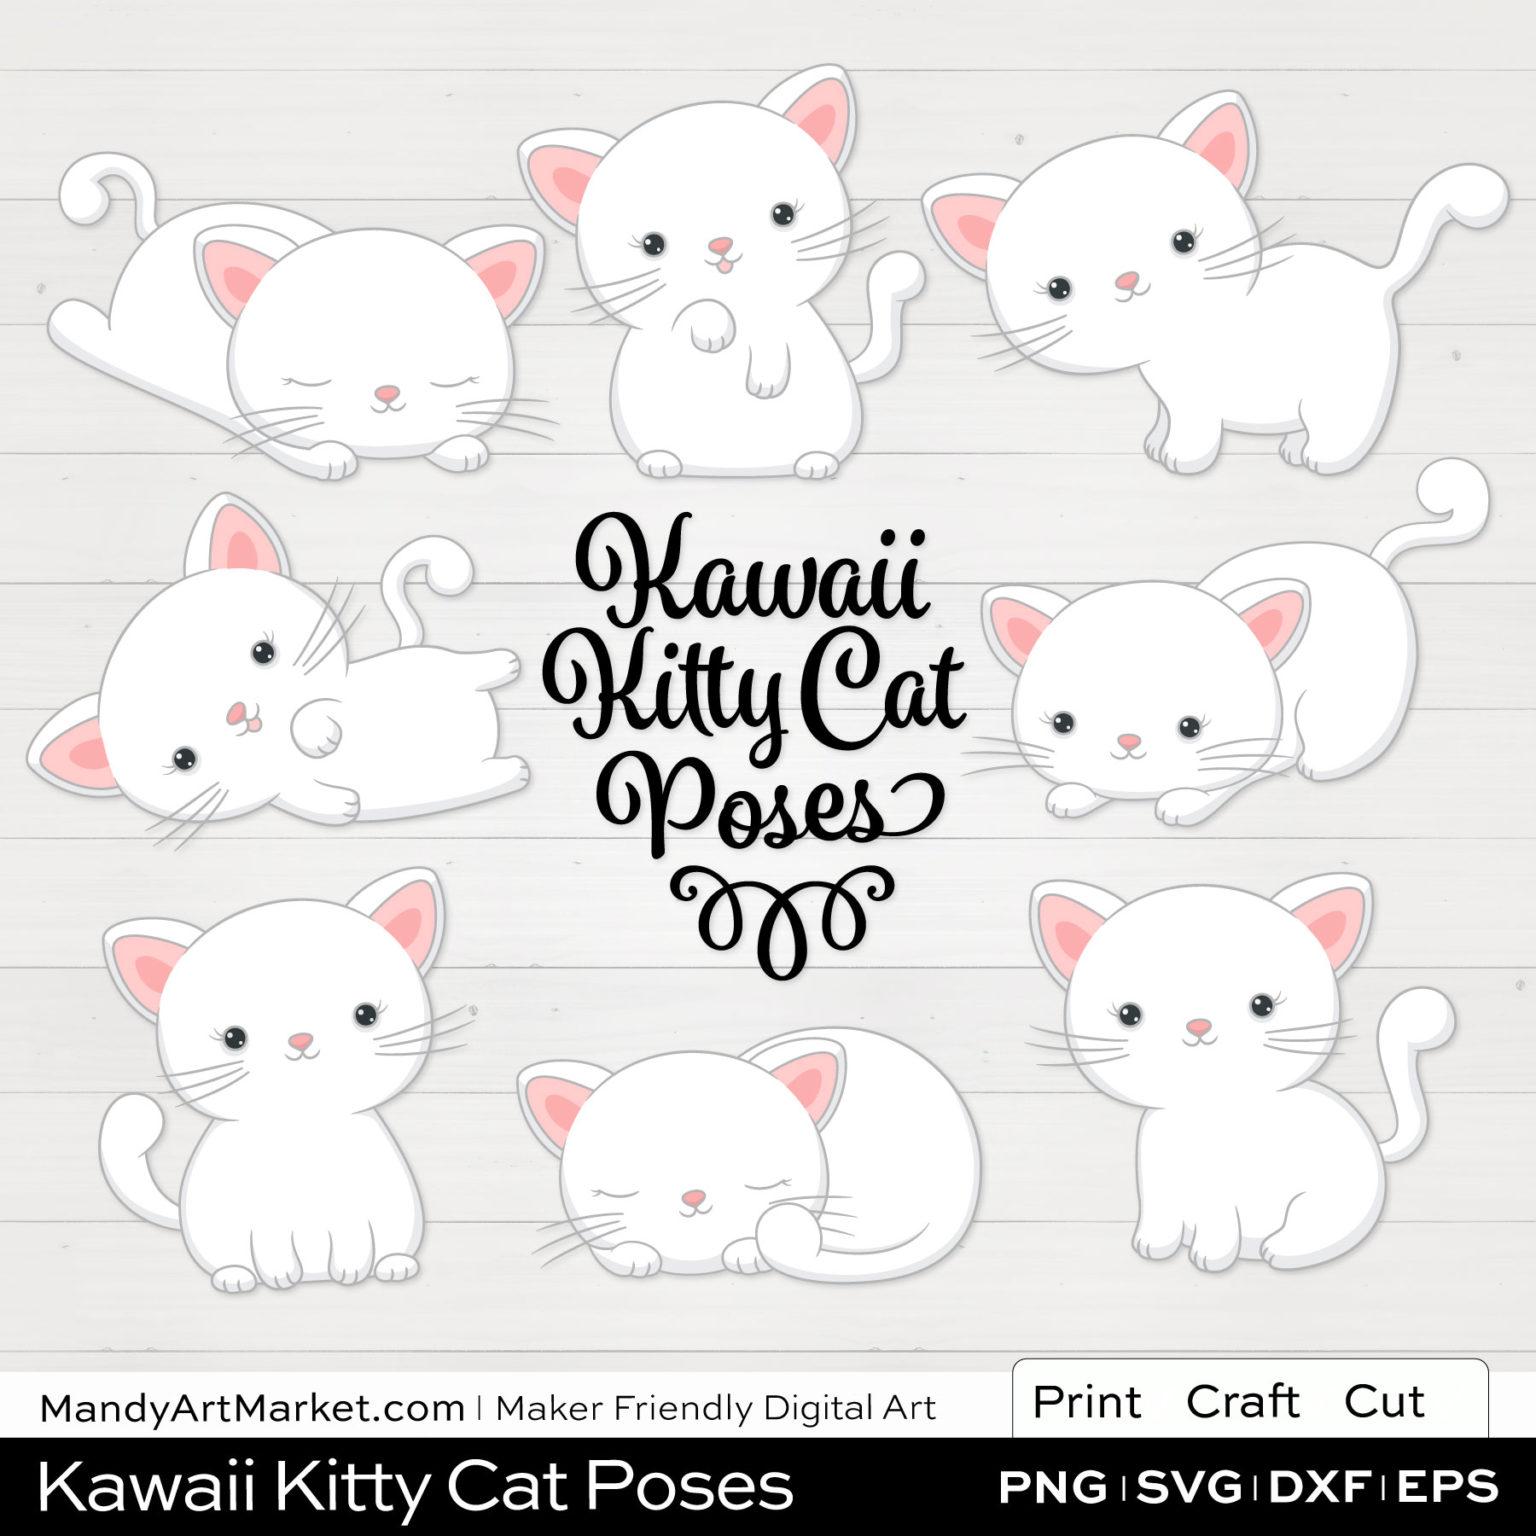 Snow White Kawaii Kitty Cat Poses Clipart on White Background